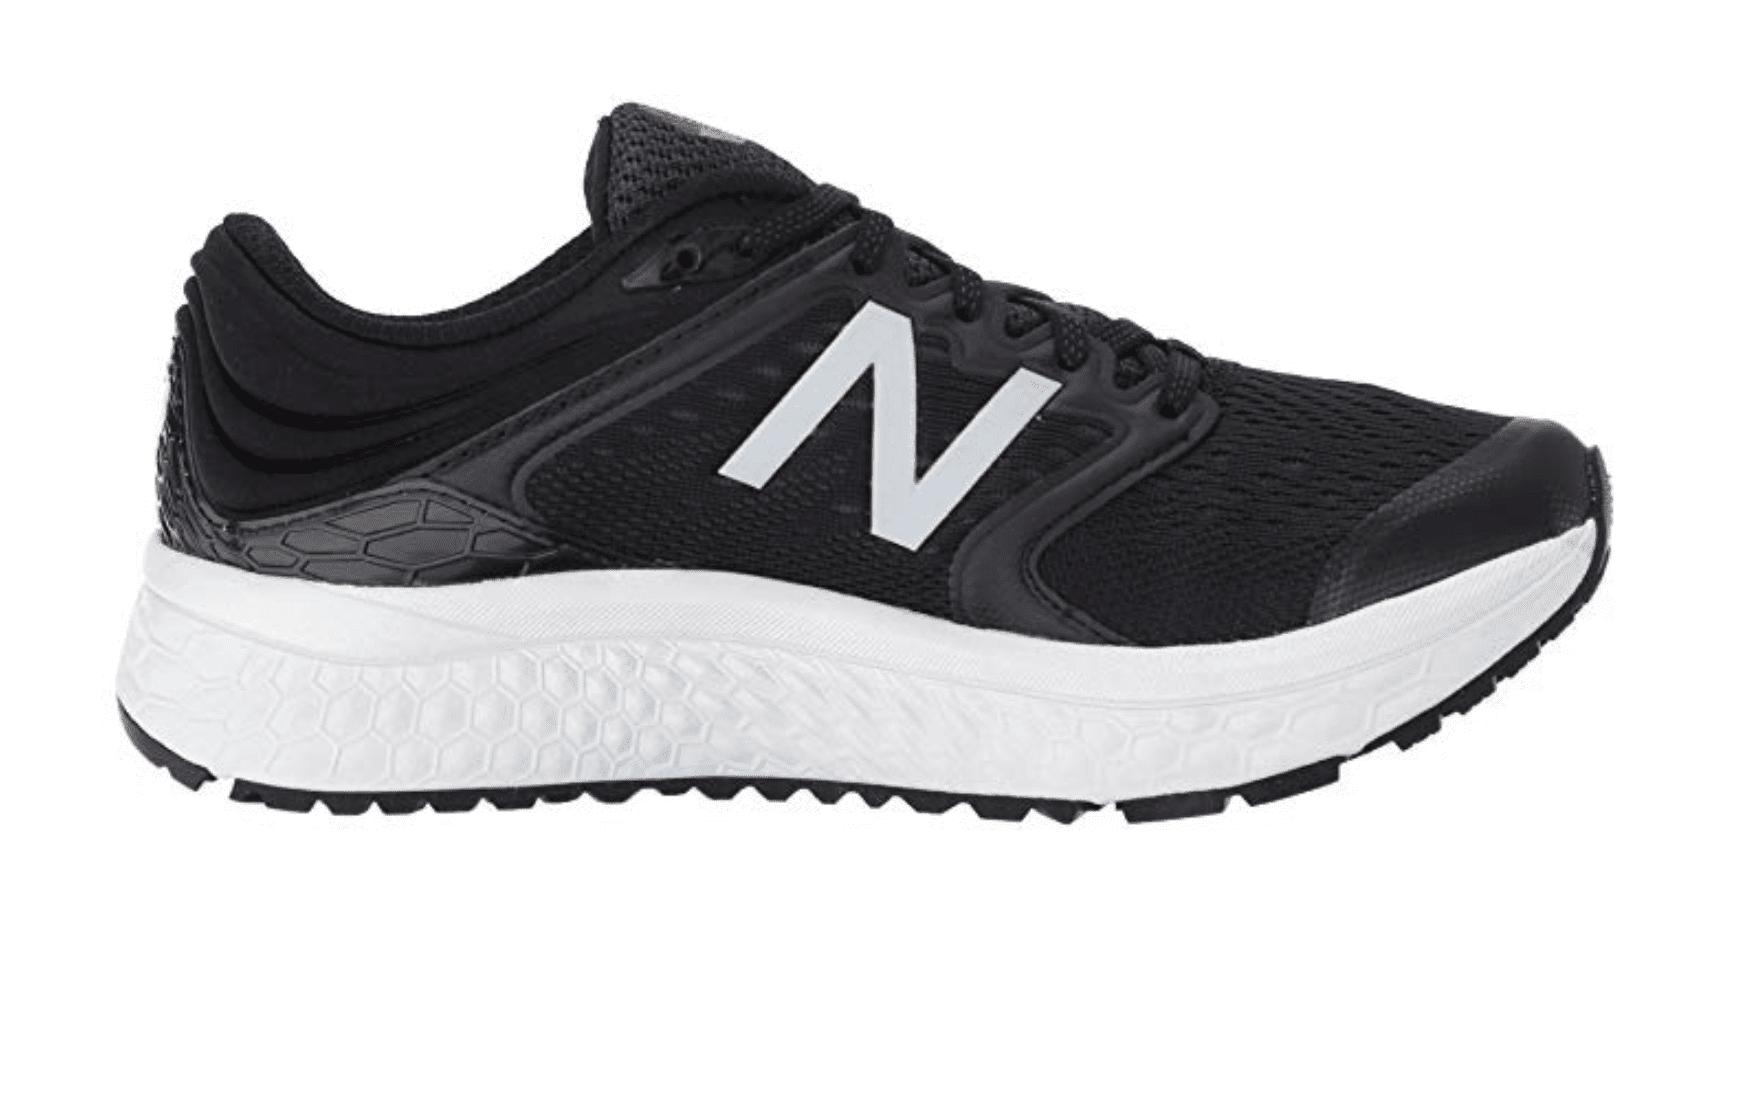 3df9c44f58d Best for Neutral-Gait Walkers  New Balance Fresh Foam 1080v8